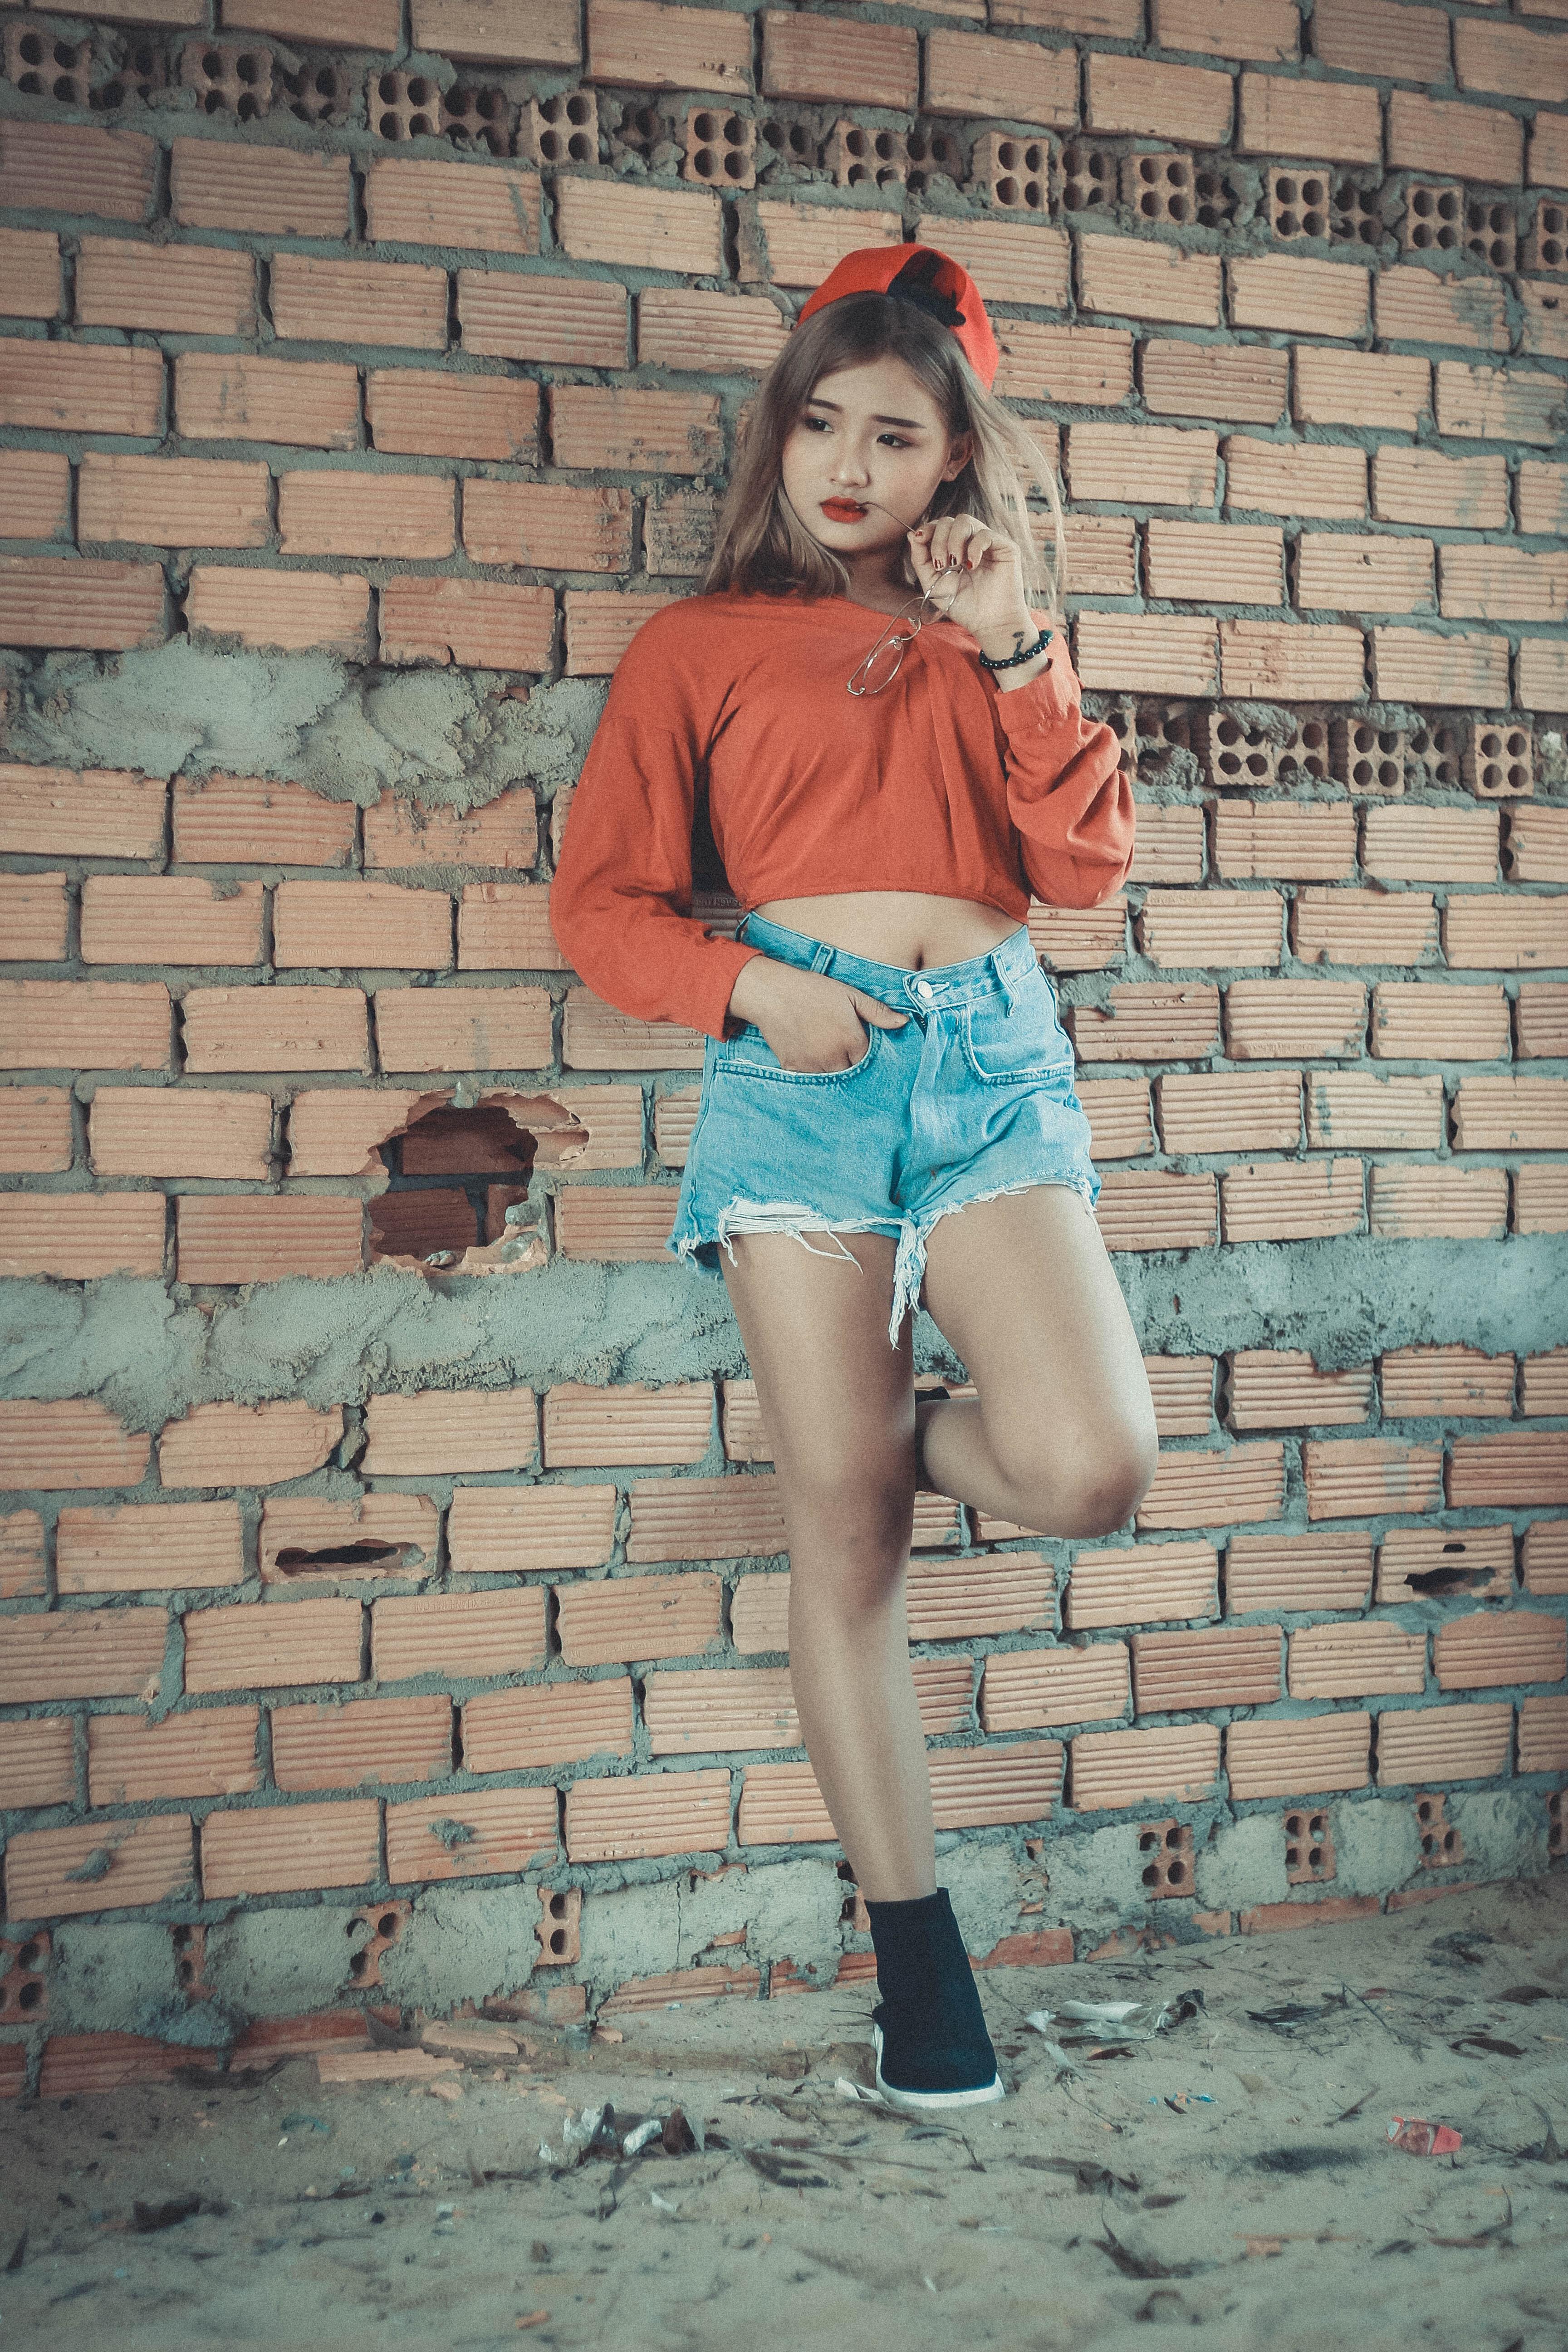 Photo of woman wearing orange crop-top near brown concrete brick wall